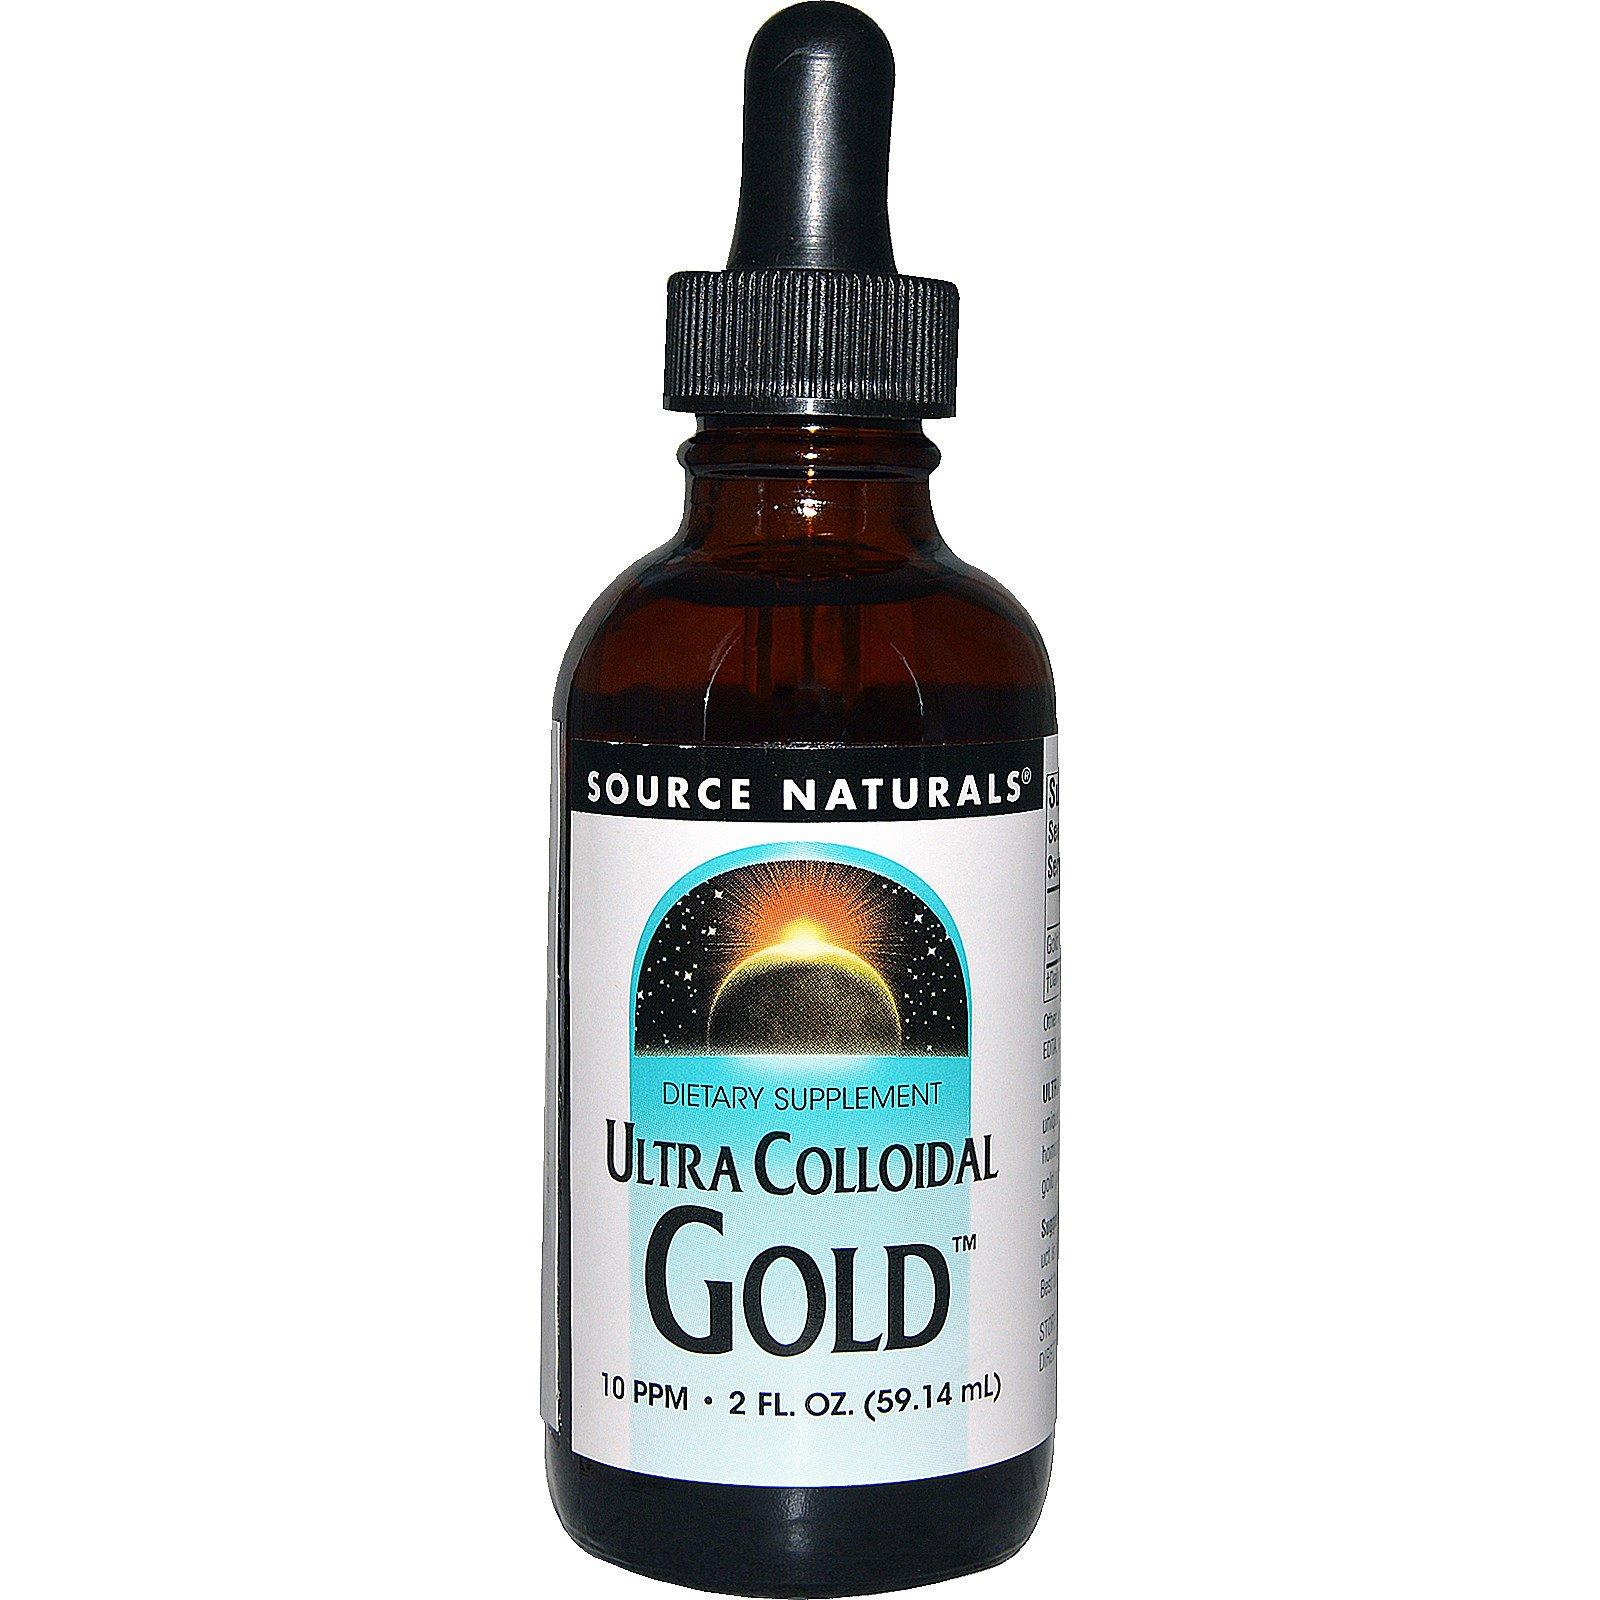 Source Naturals, Ультра коллоидное золото 10 мг/л, 2 жидких унции (59,14 мл)